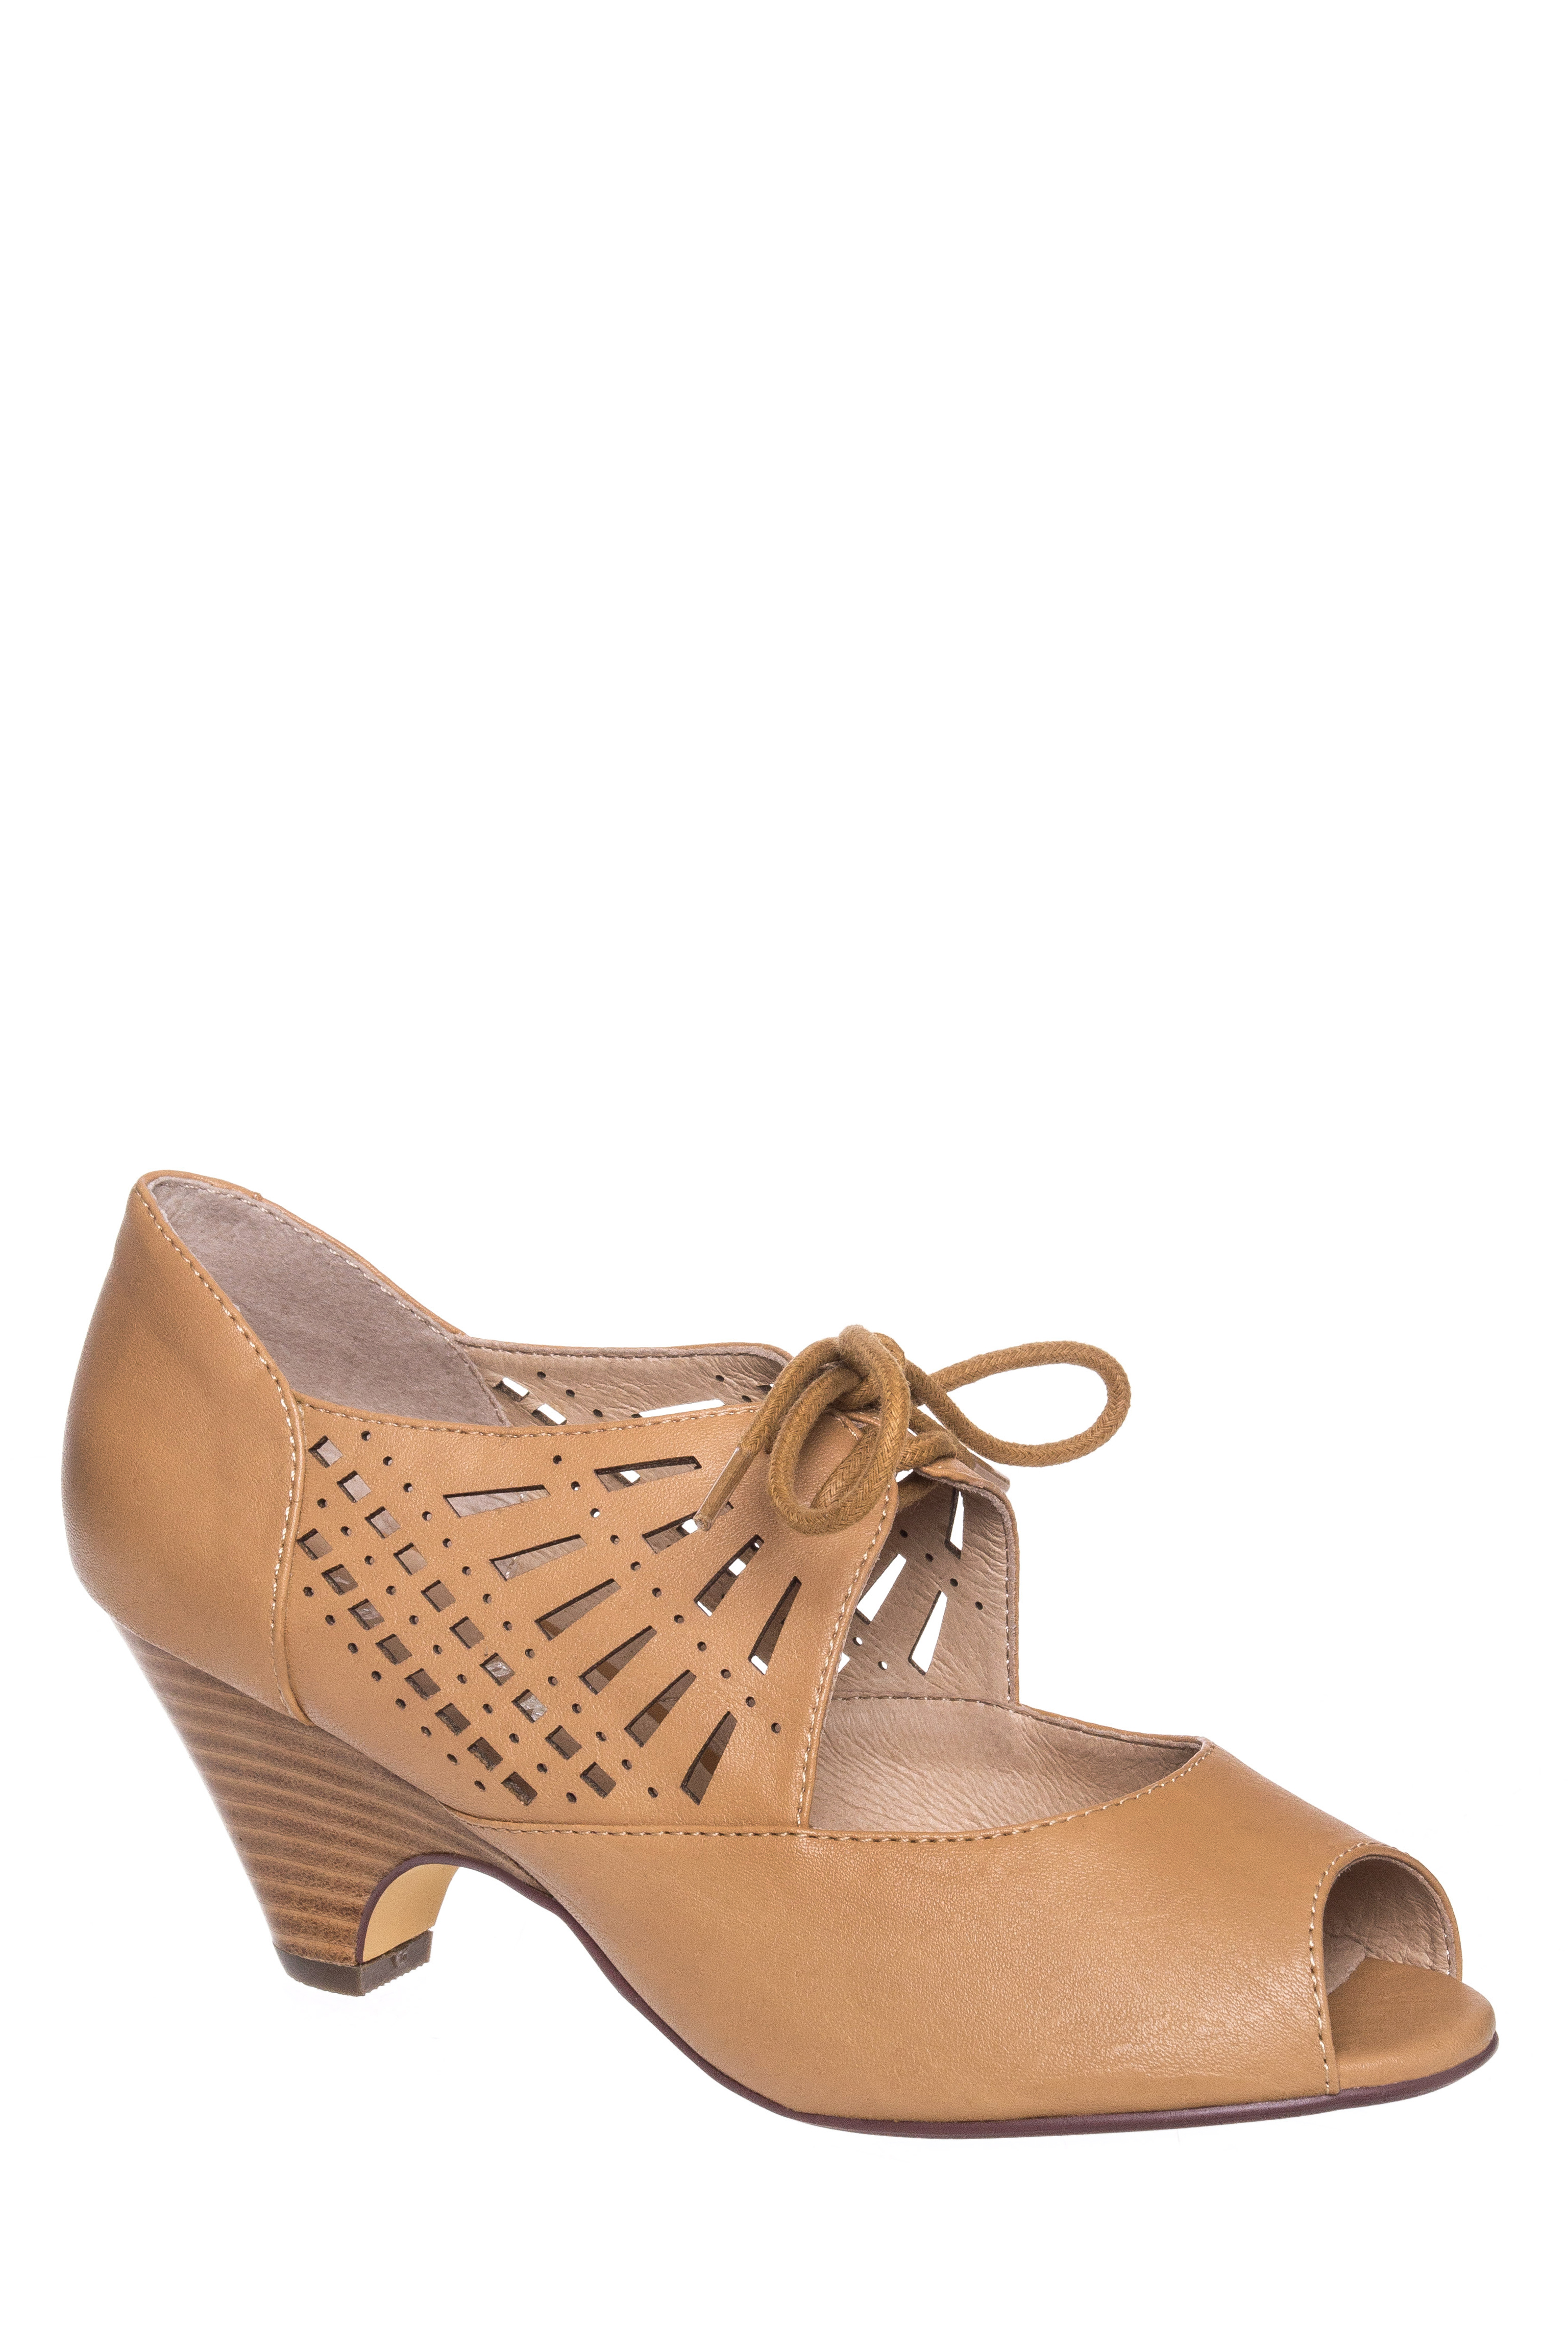 1930s Style Shoes Chelsea Crew Javits Low Heel Pump - Nude $69.99 AT vintagedancer.com